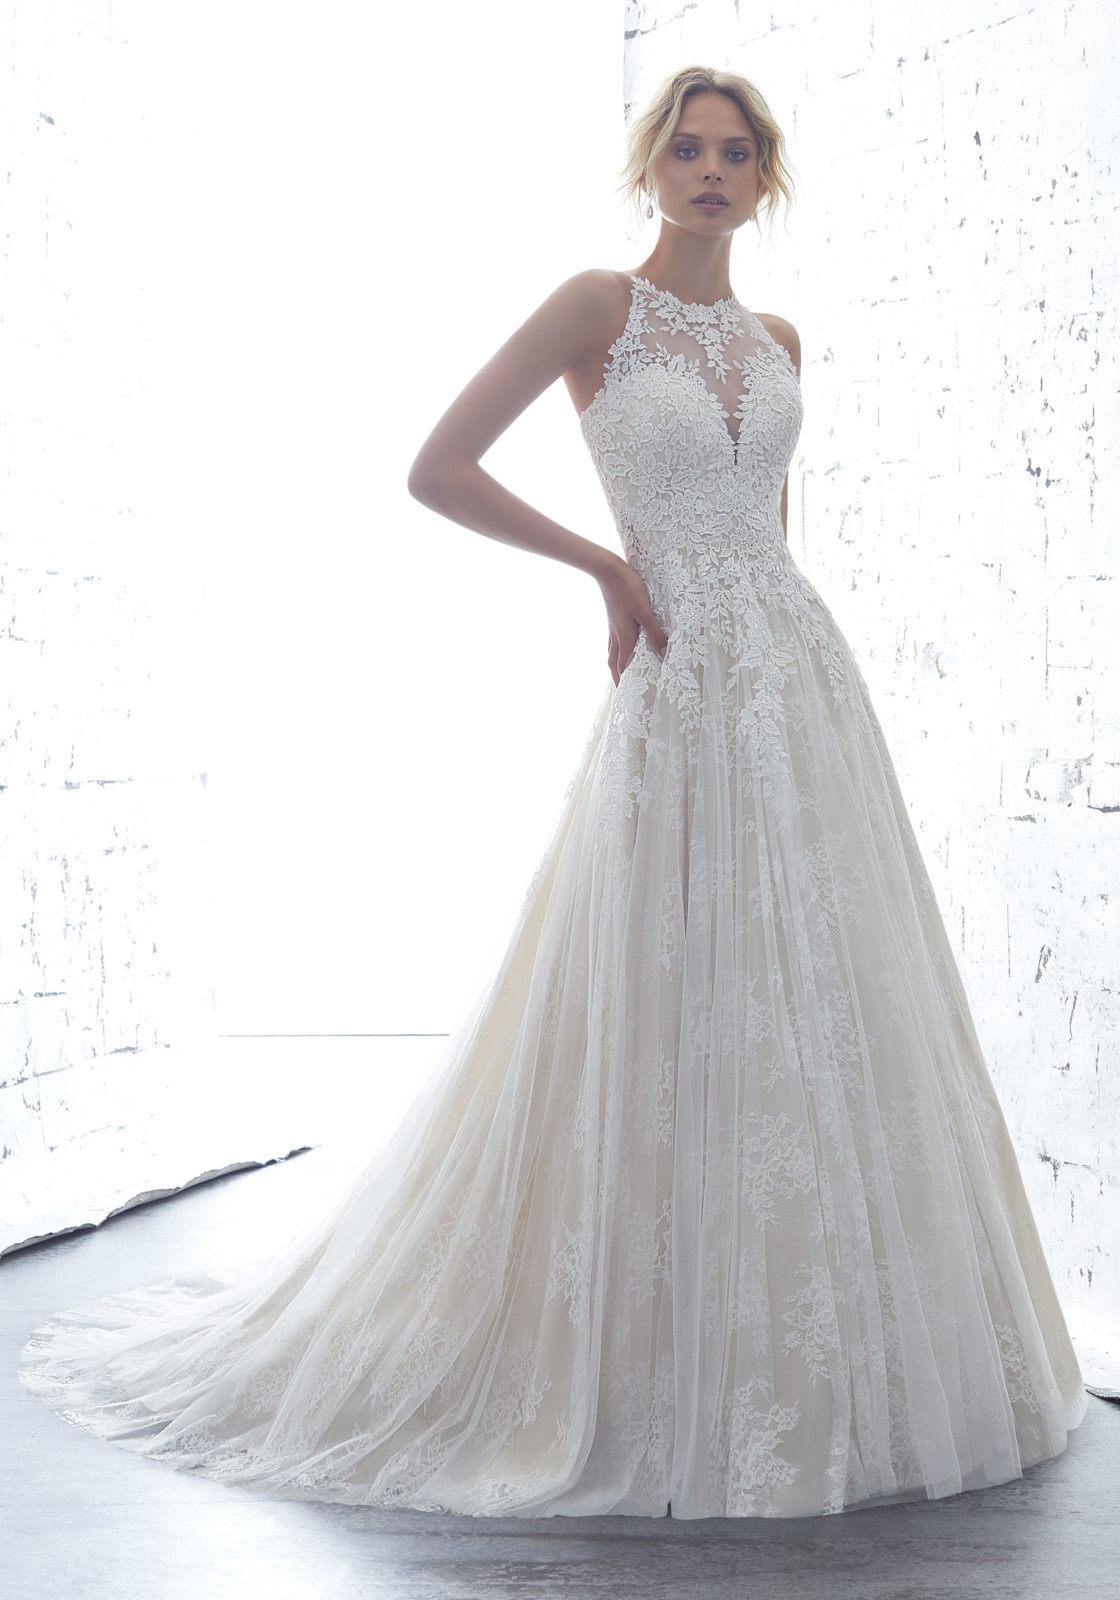 b88b0e7569 China Sheer Lace Bridal Gowns Sleeveless 2018 Beach Wedding Dresses ...